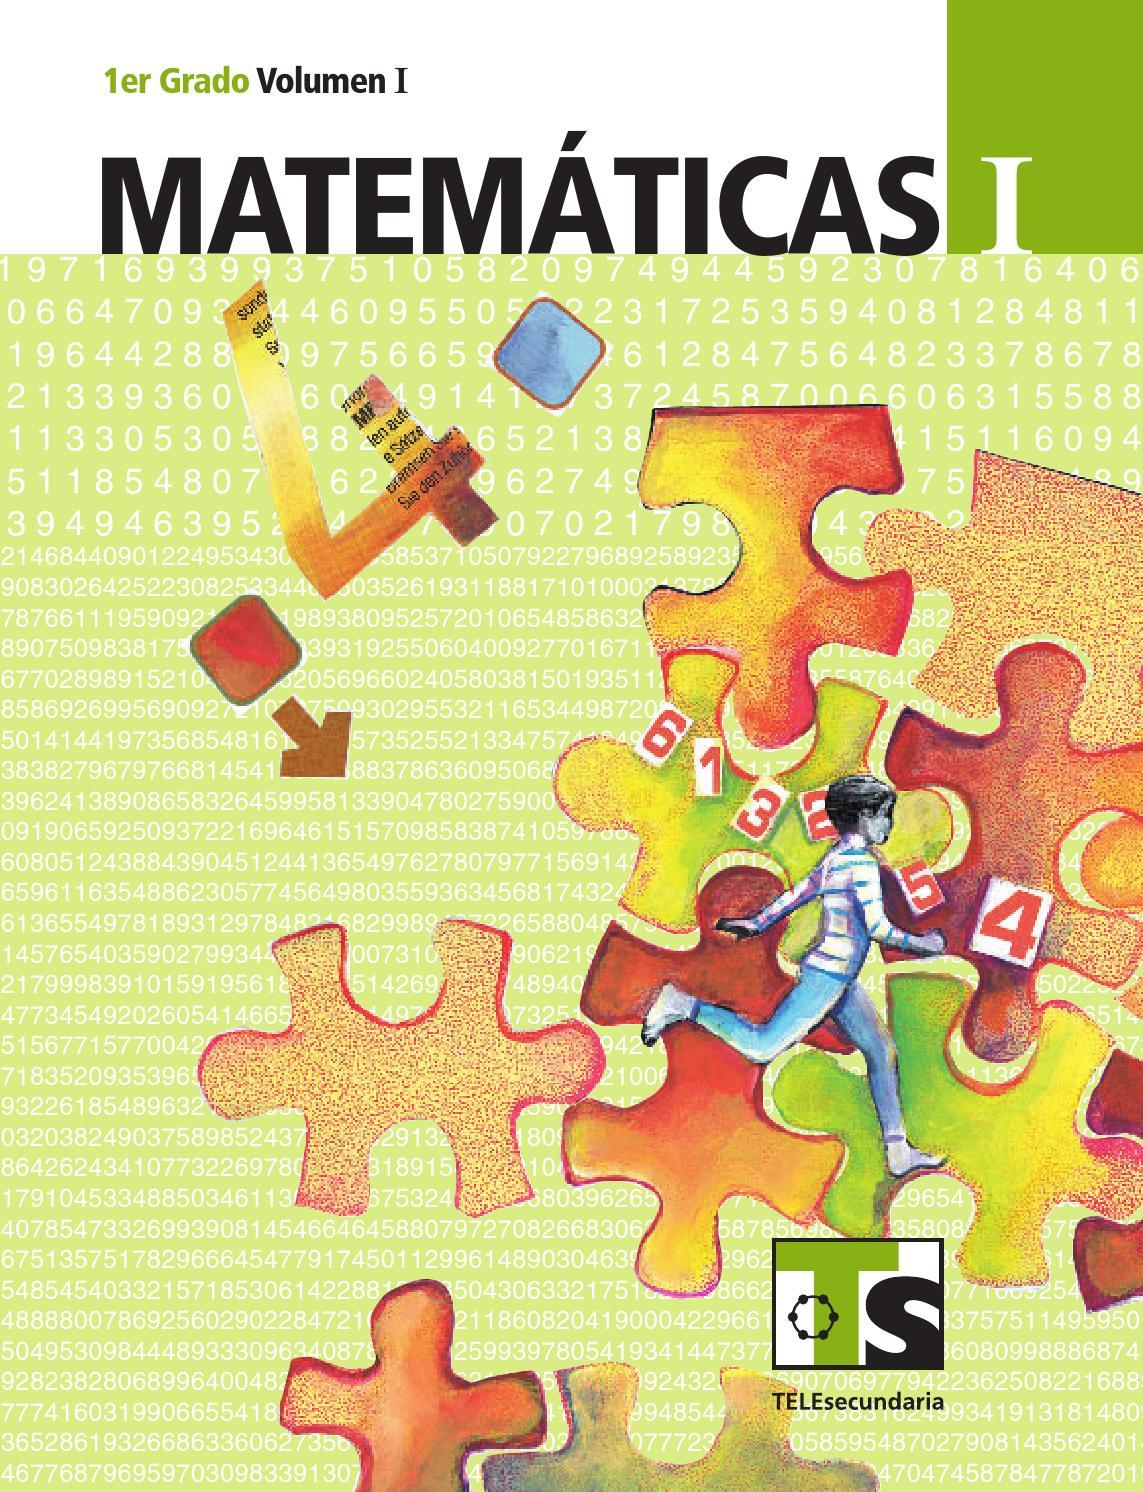 Matemáticas 1er. Grado Volumen I by Rarámuri - issuu